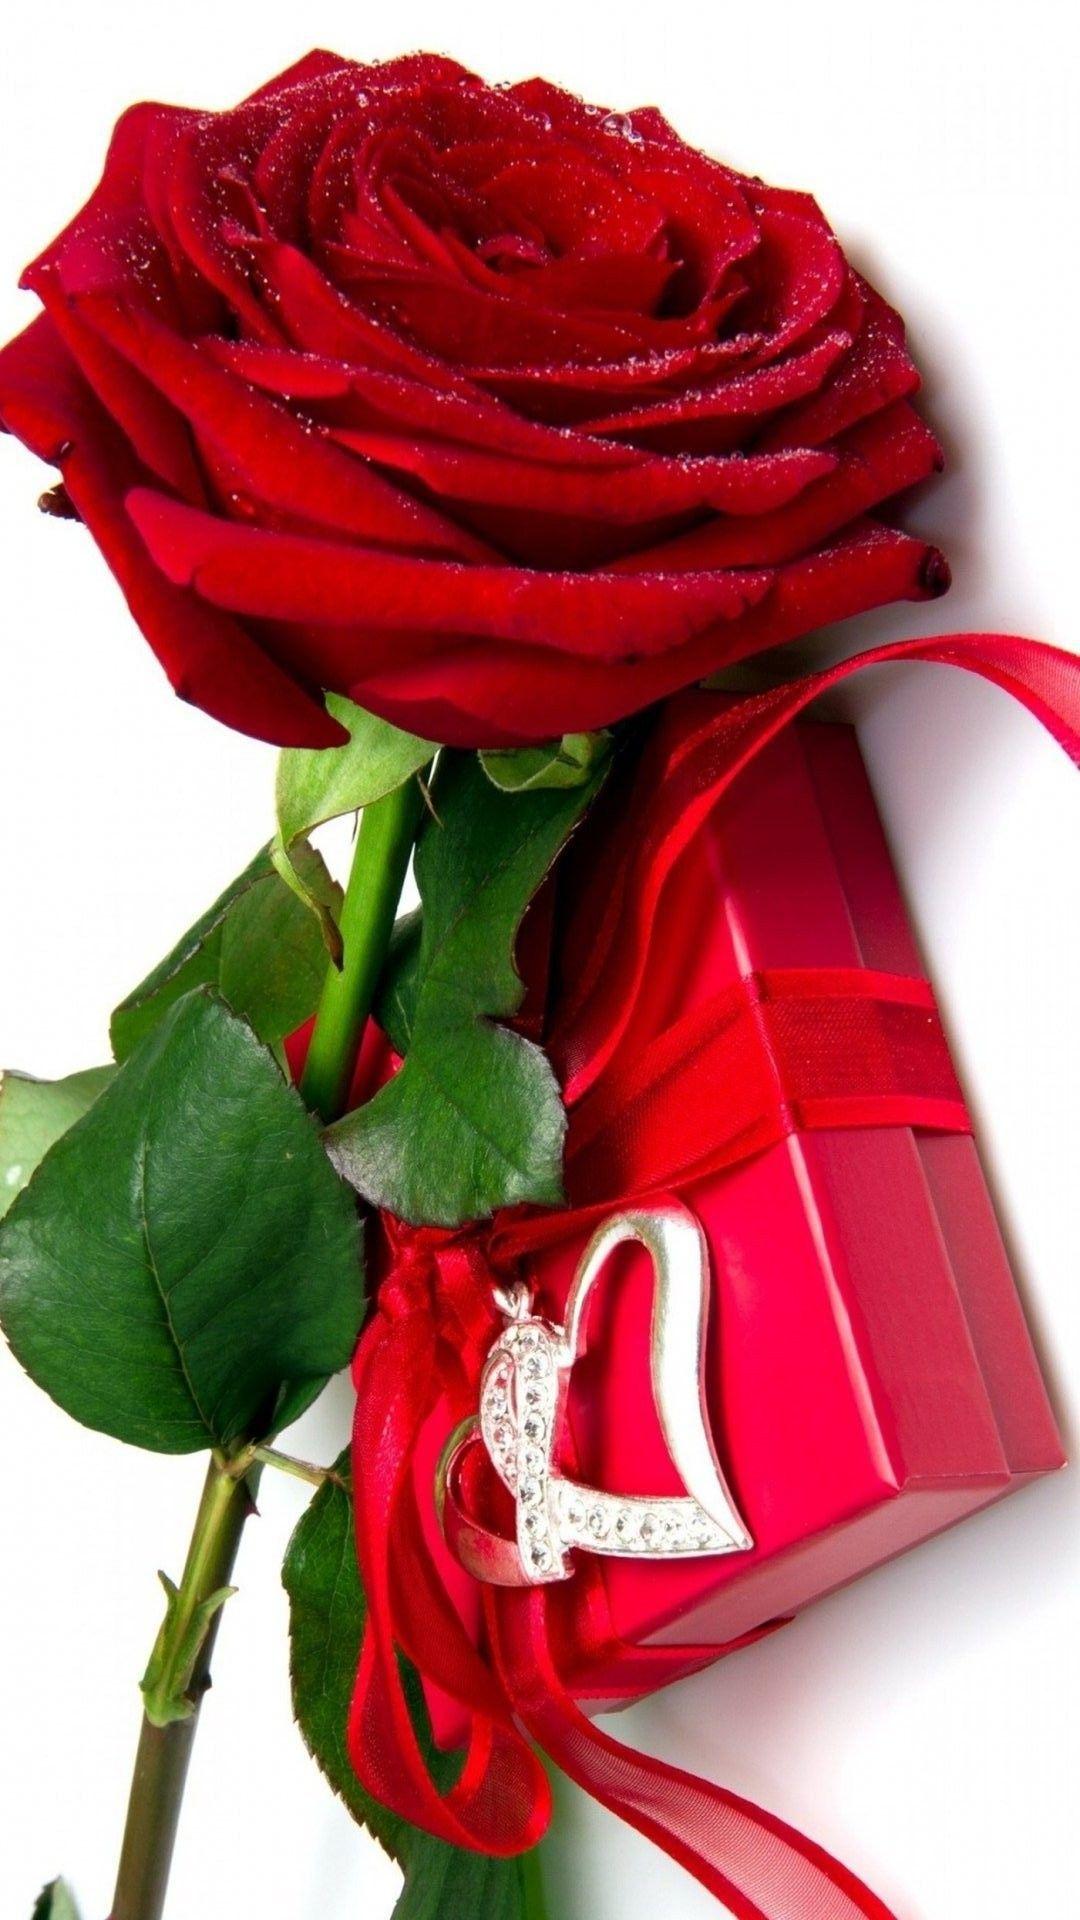 Red Rose Wallpaper Mobile Best Hd Wallpapers Cvetochnye Oboi Kartinki S Serdcem Buket Krasnoj Rozy Pl Red Rose Flower Red Rose Pictures Beautiful Red Roses